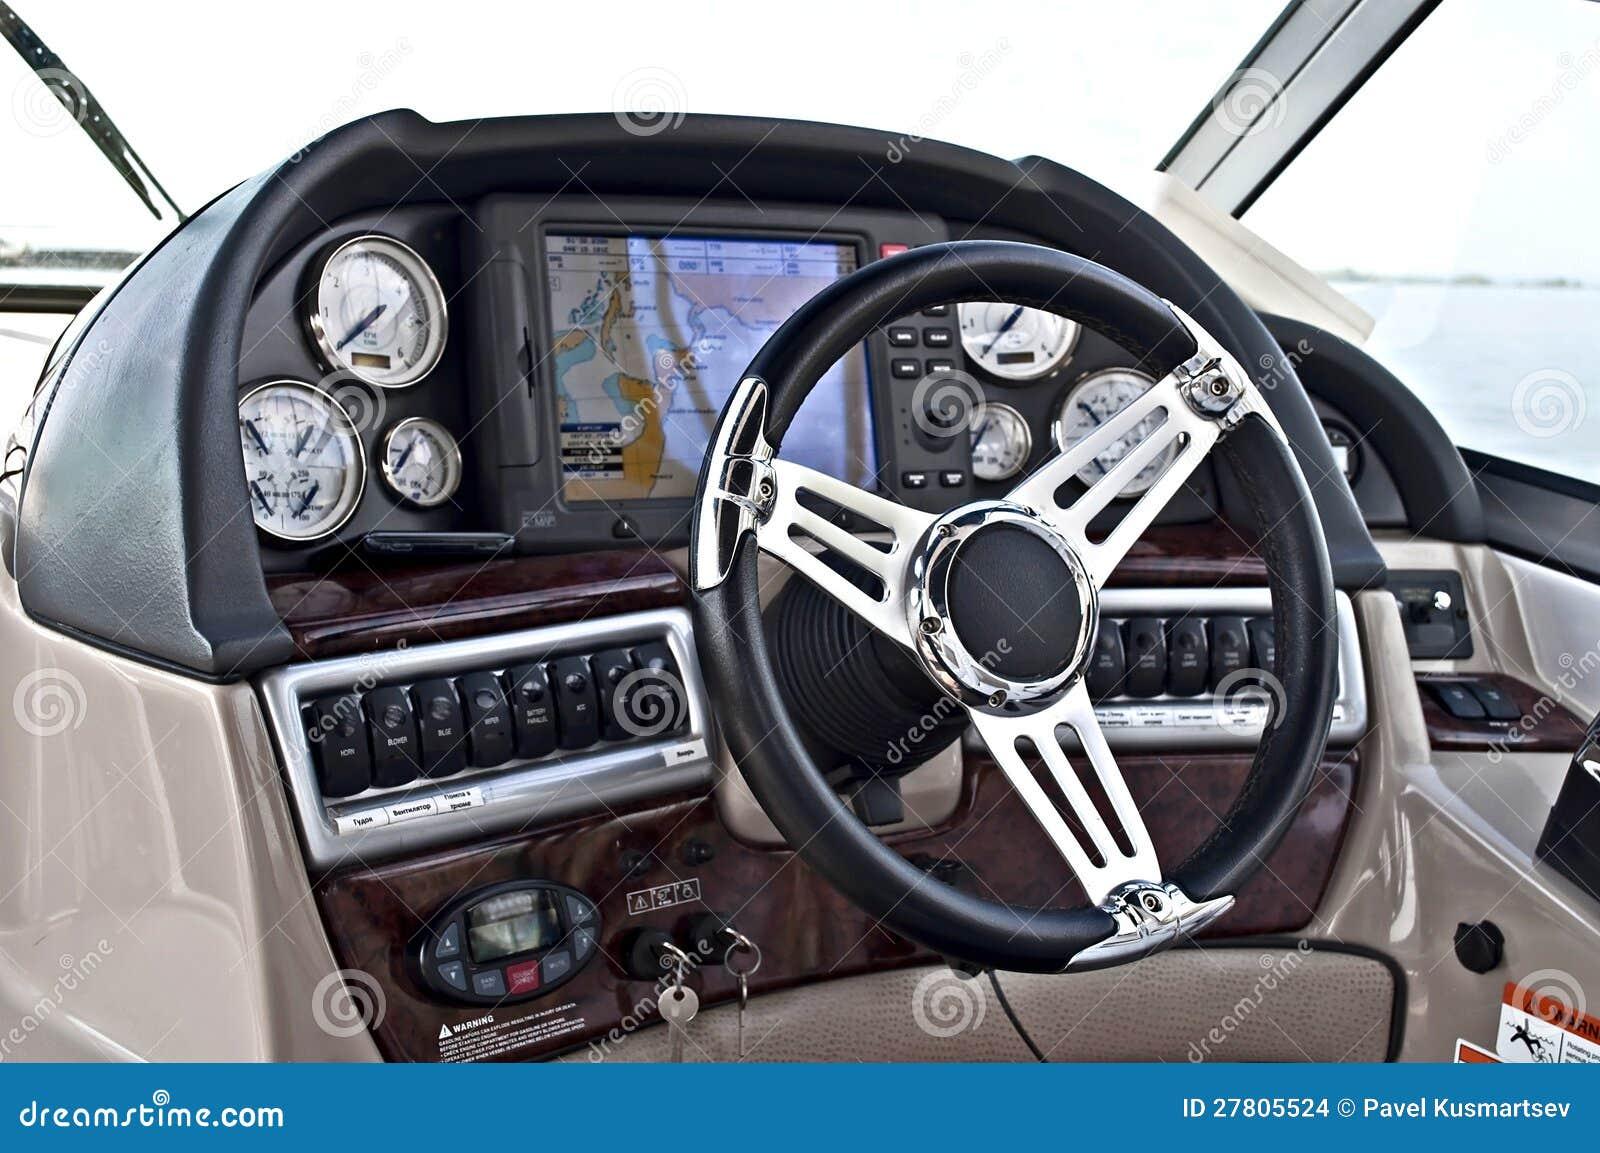 Cockpit Instrument Panel : Instrument panel of a motor boat cockpit stock images